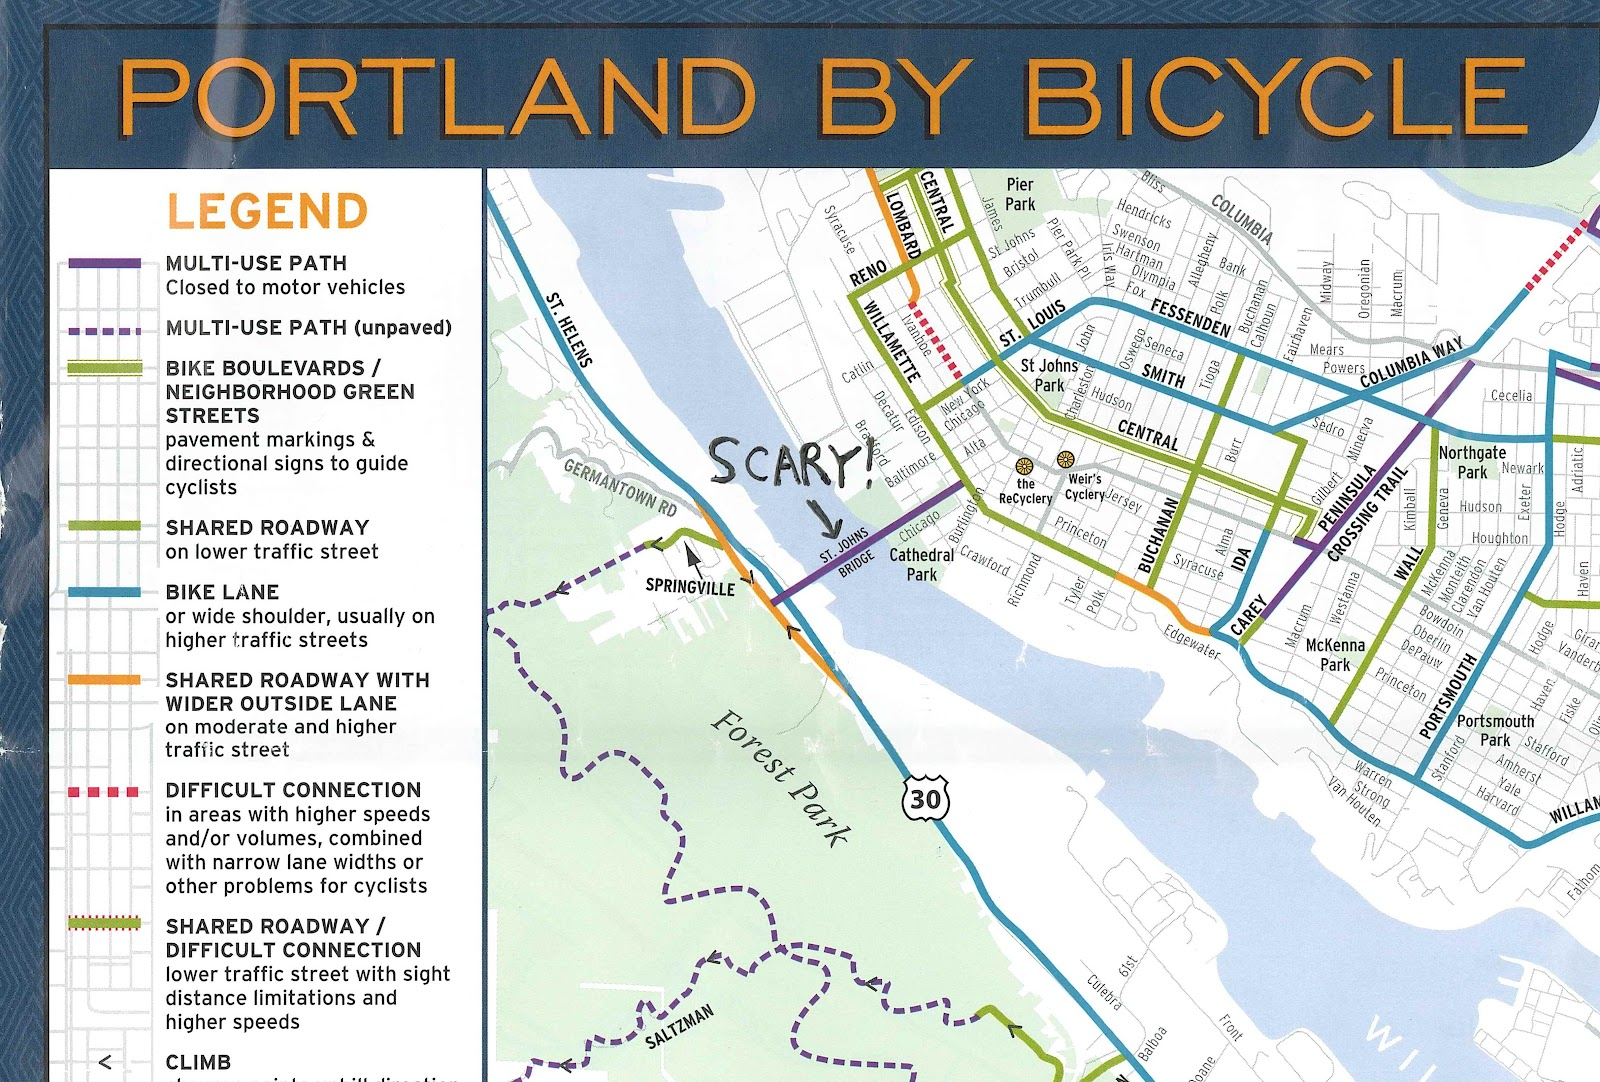 Madison Bike Life St Johns Bridge  Portland How About